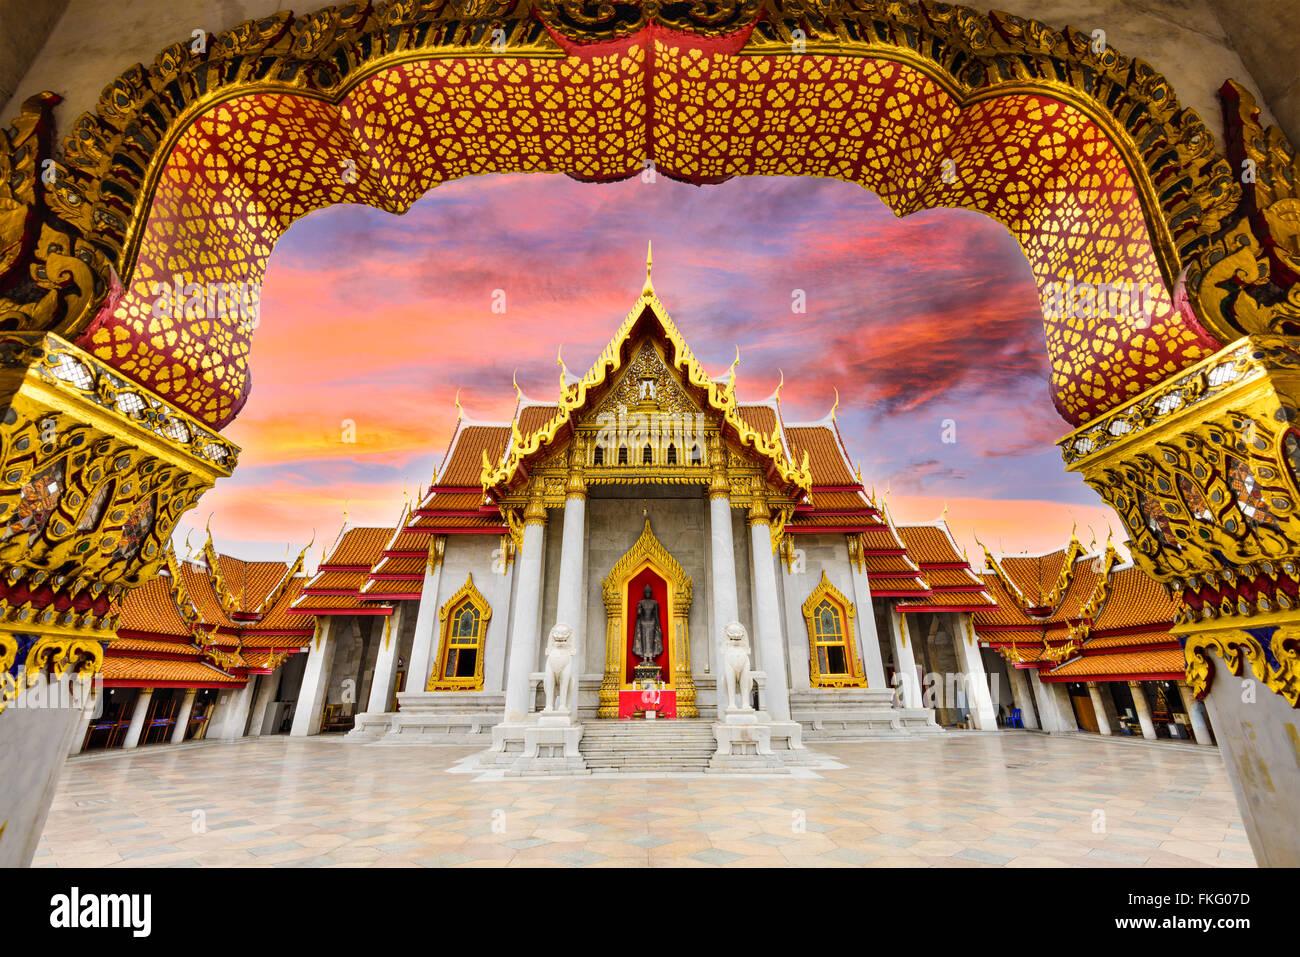 Marble Temple of Bangkok, Thailand. - Stock Image